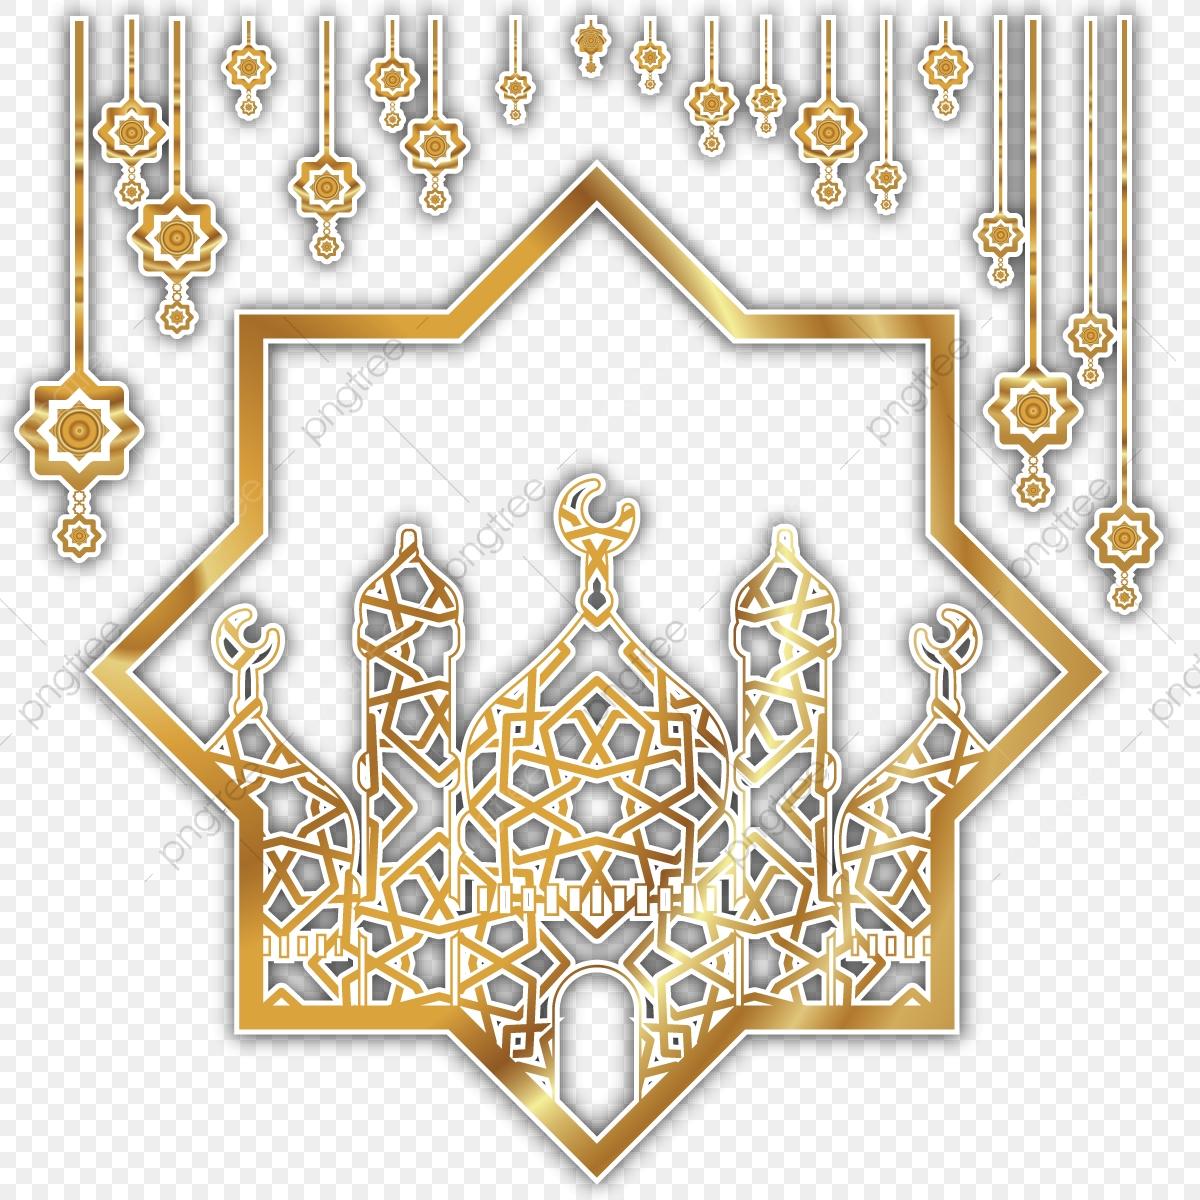 Arabic Vector Design Eid Al Adha, Arabic, Islamic, Pattern PNG and.